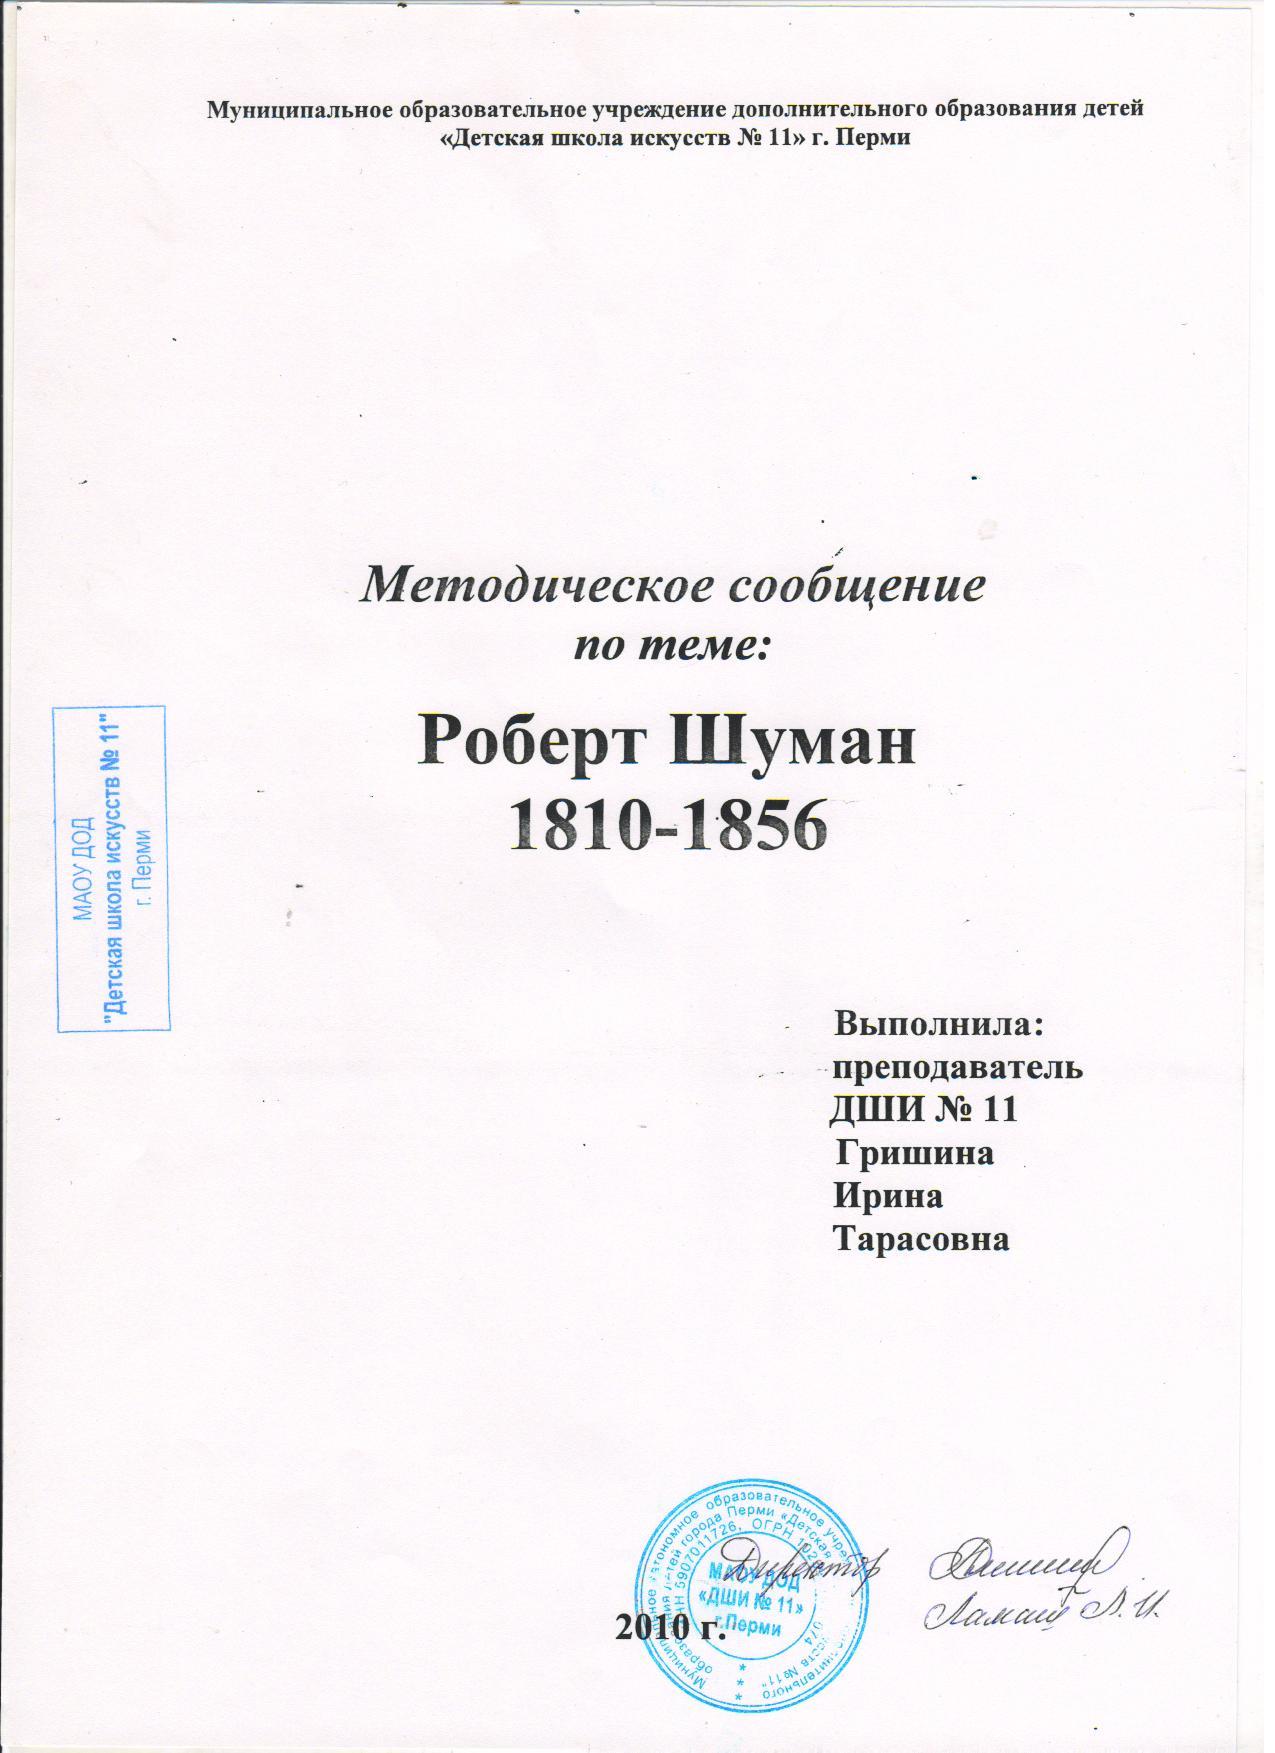 C:\Documents and Settings\Учитель\Рабочий стол\Шуман 001.jpg